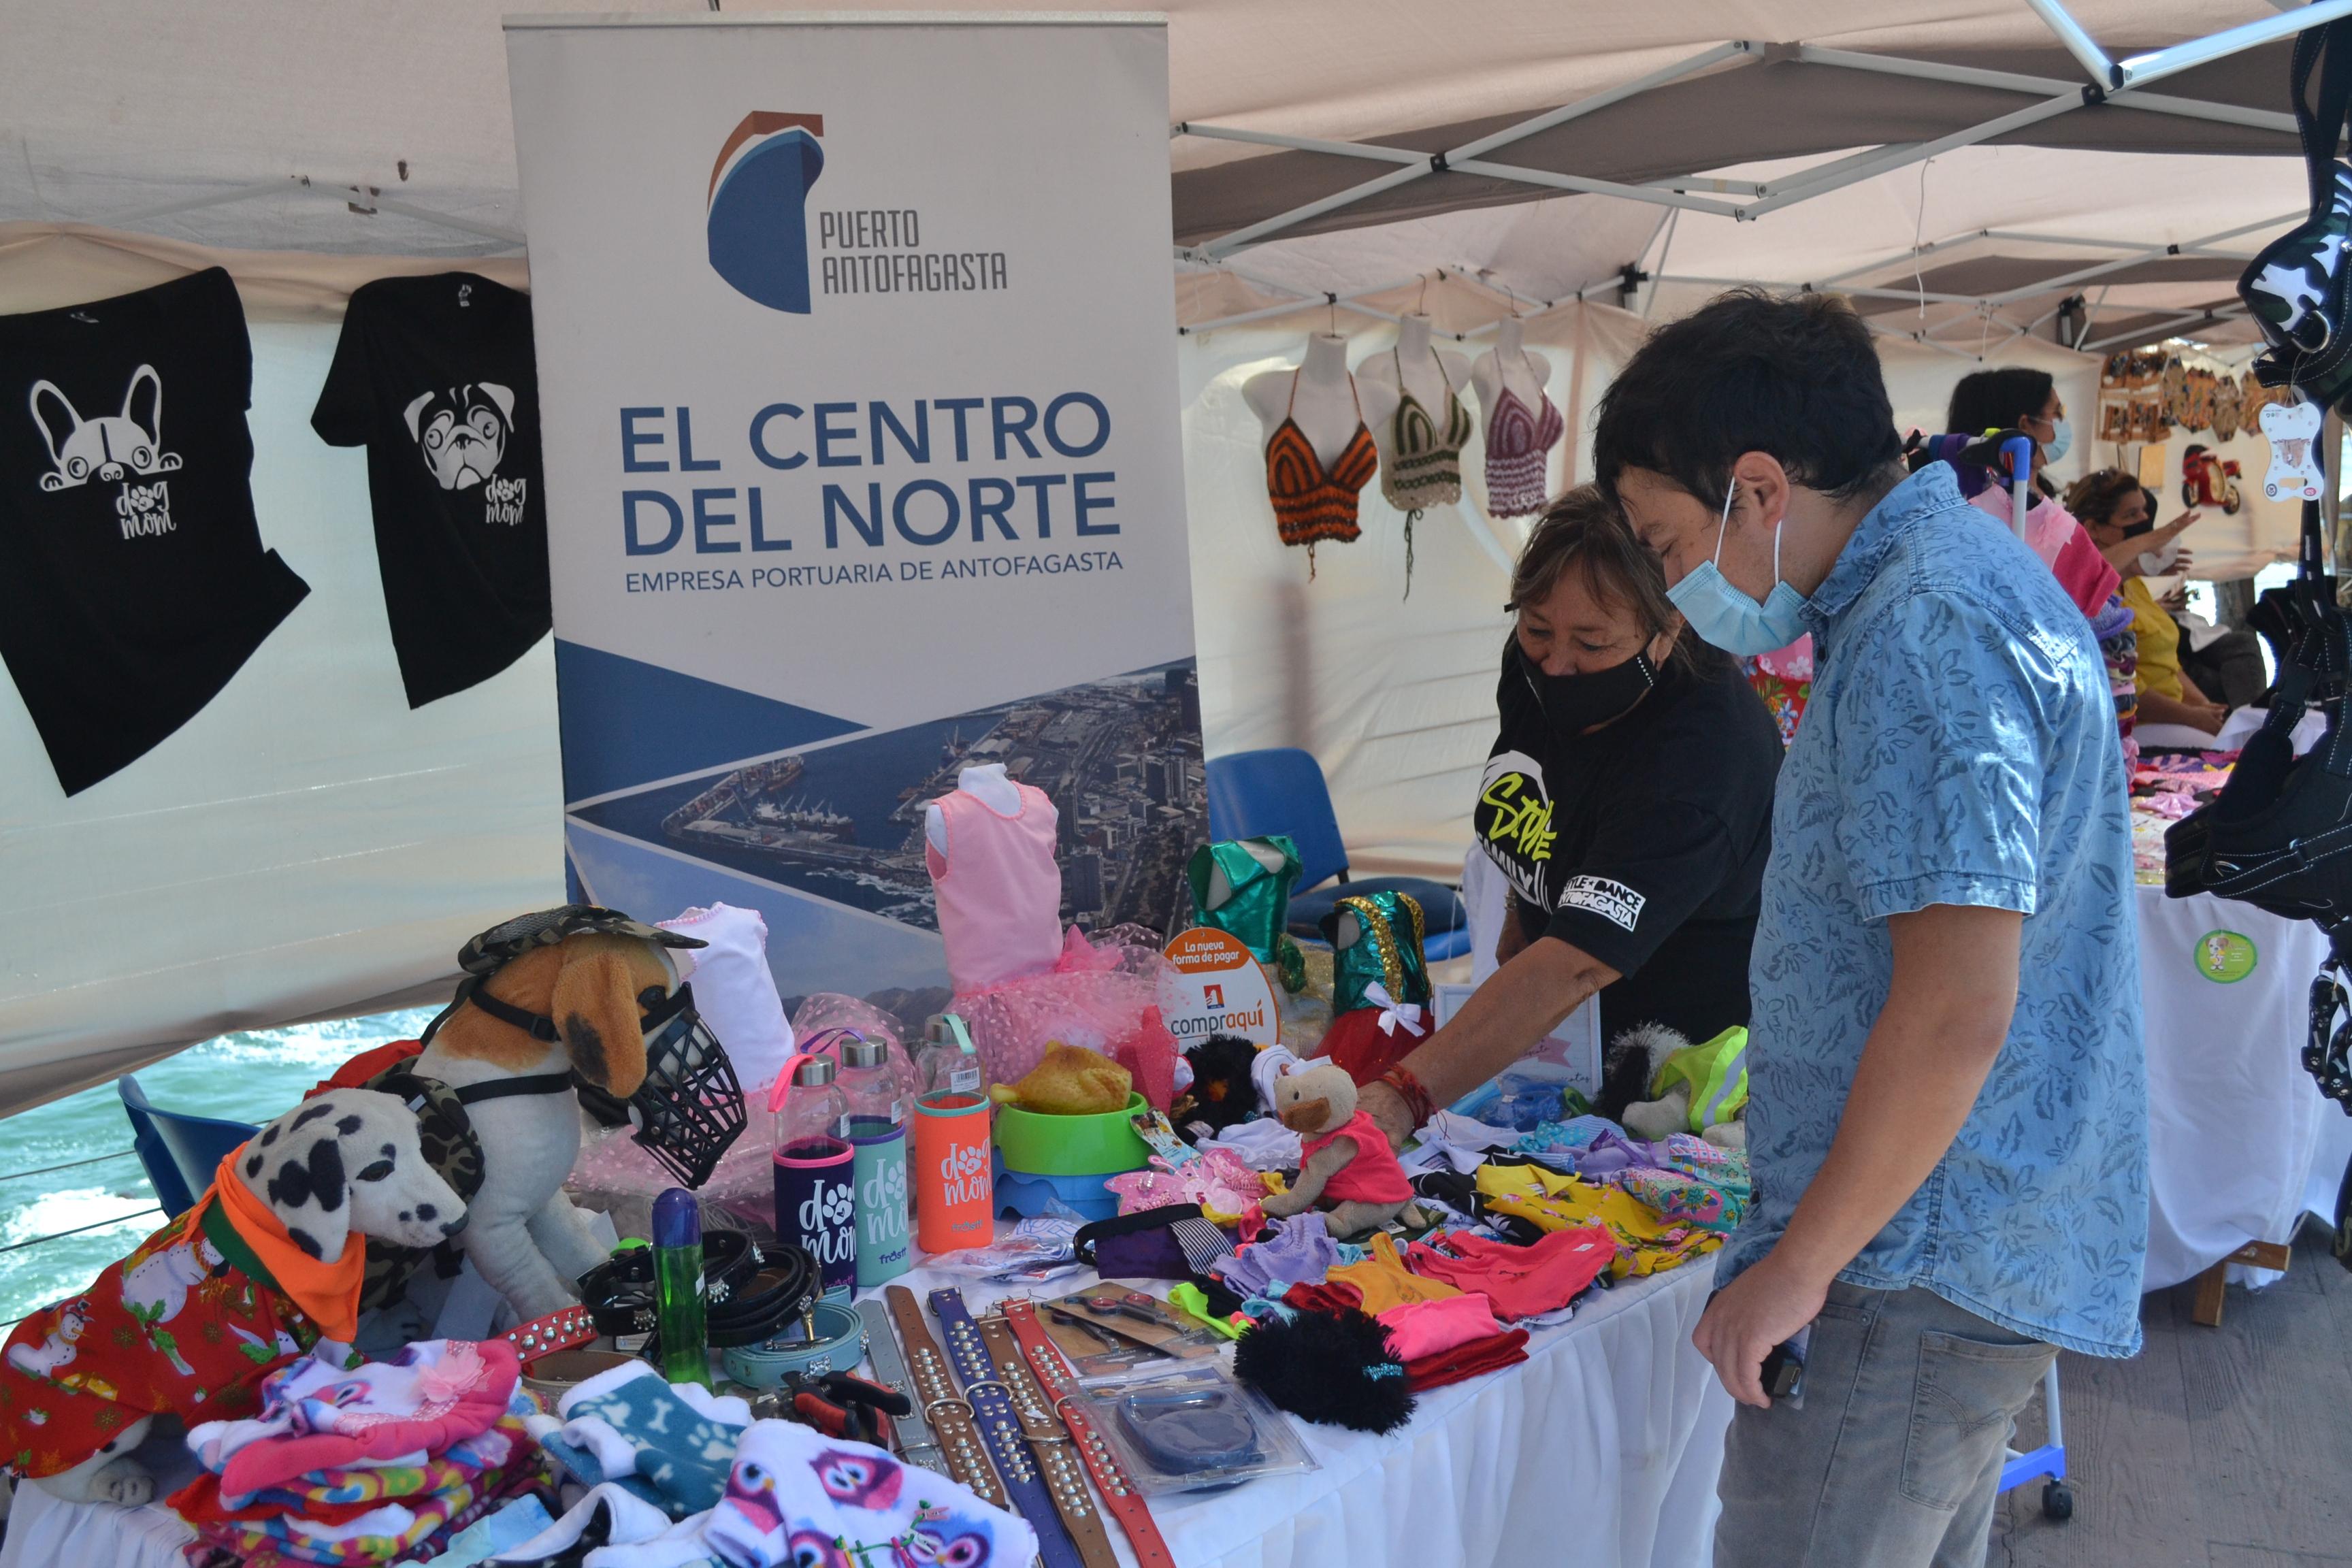 Feria de Emprendedores en las Terrazas de Mallplaza Antofagasta concesionaria de EPA